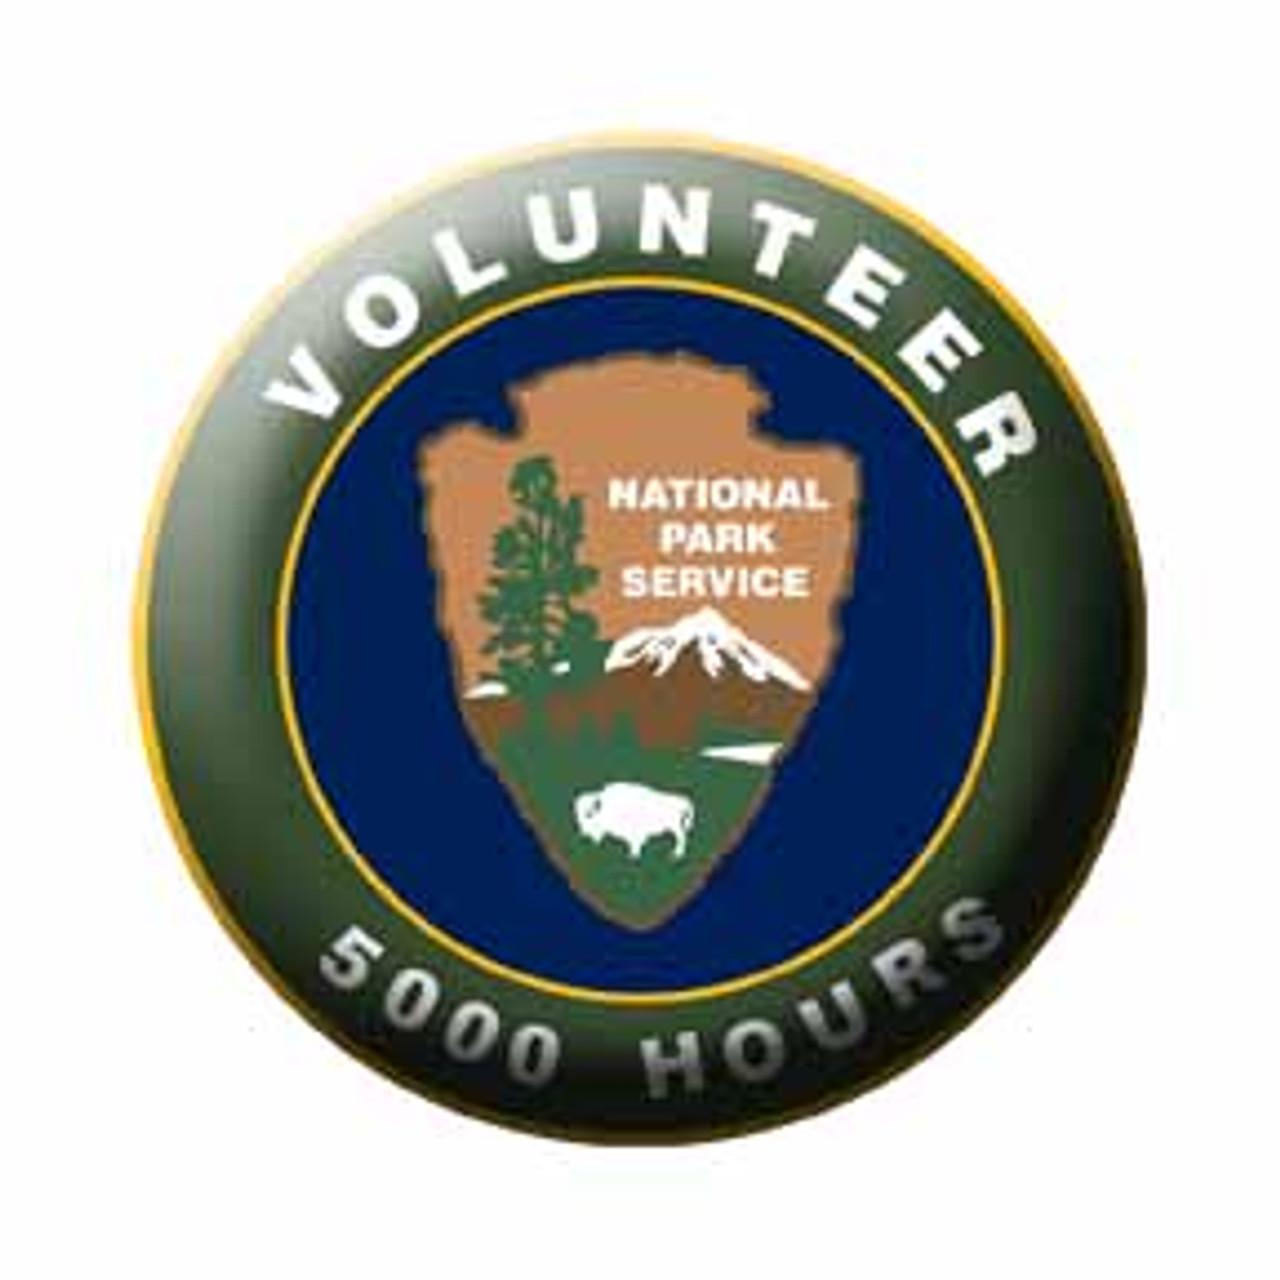 National Park Service Volunteer Hour Pins (4750 hours)